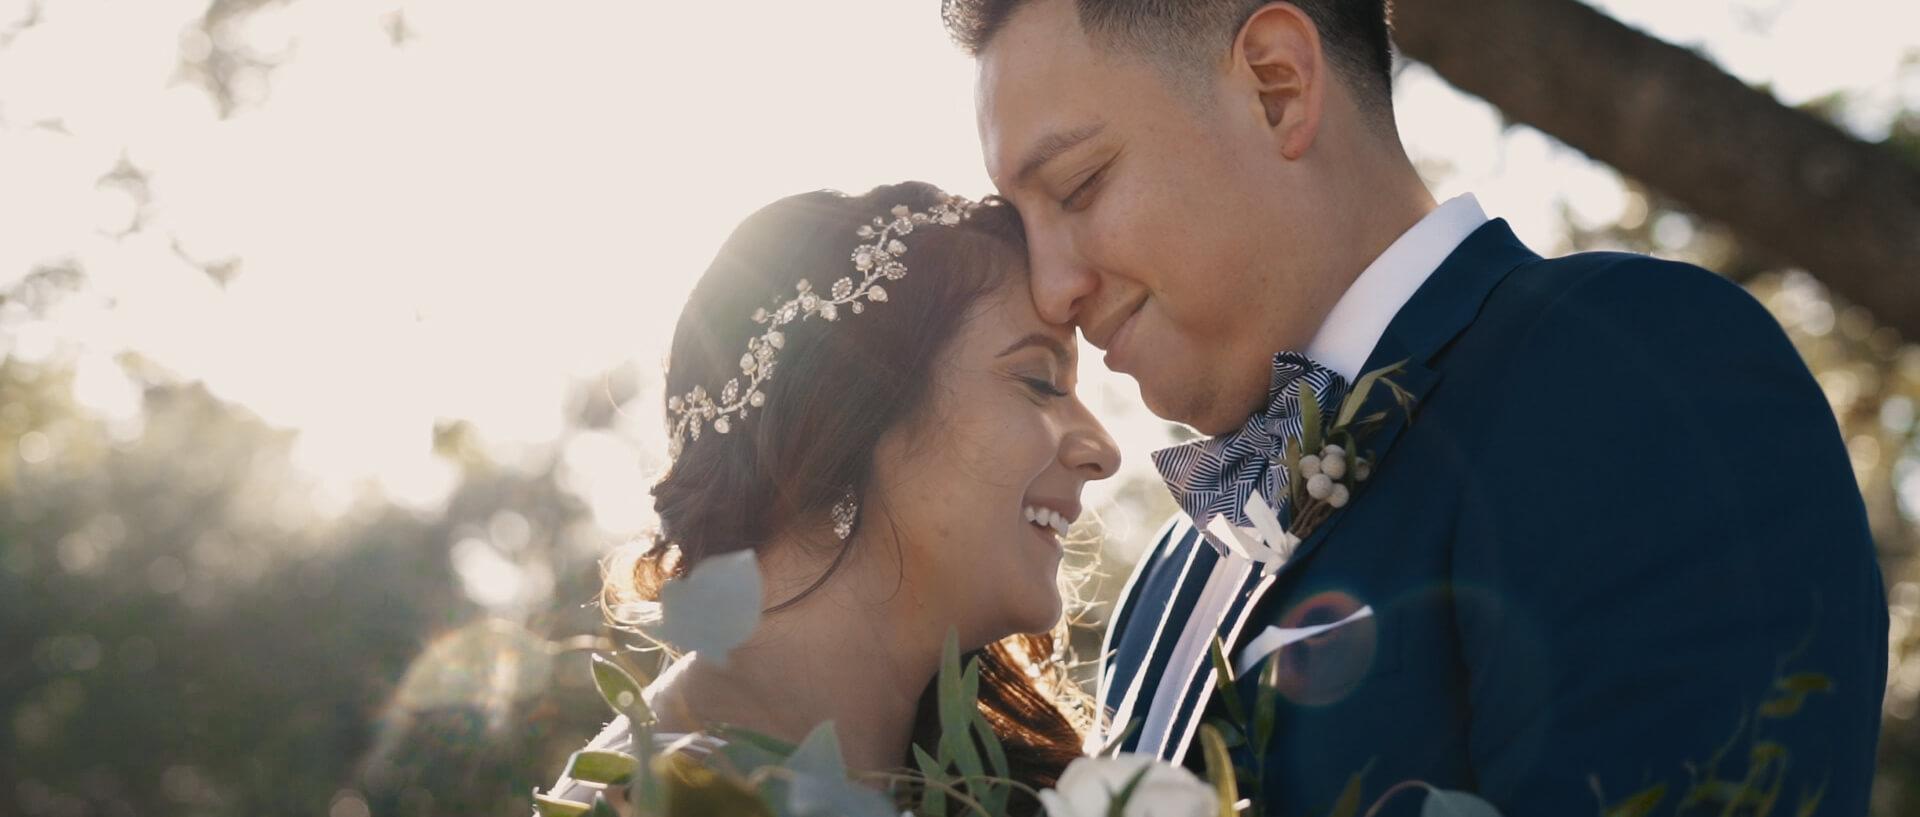 Bride and Groom in Sunlight